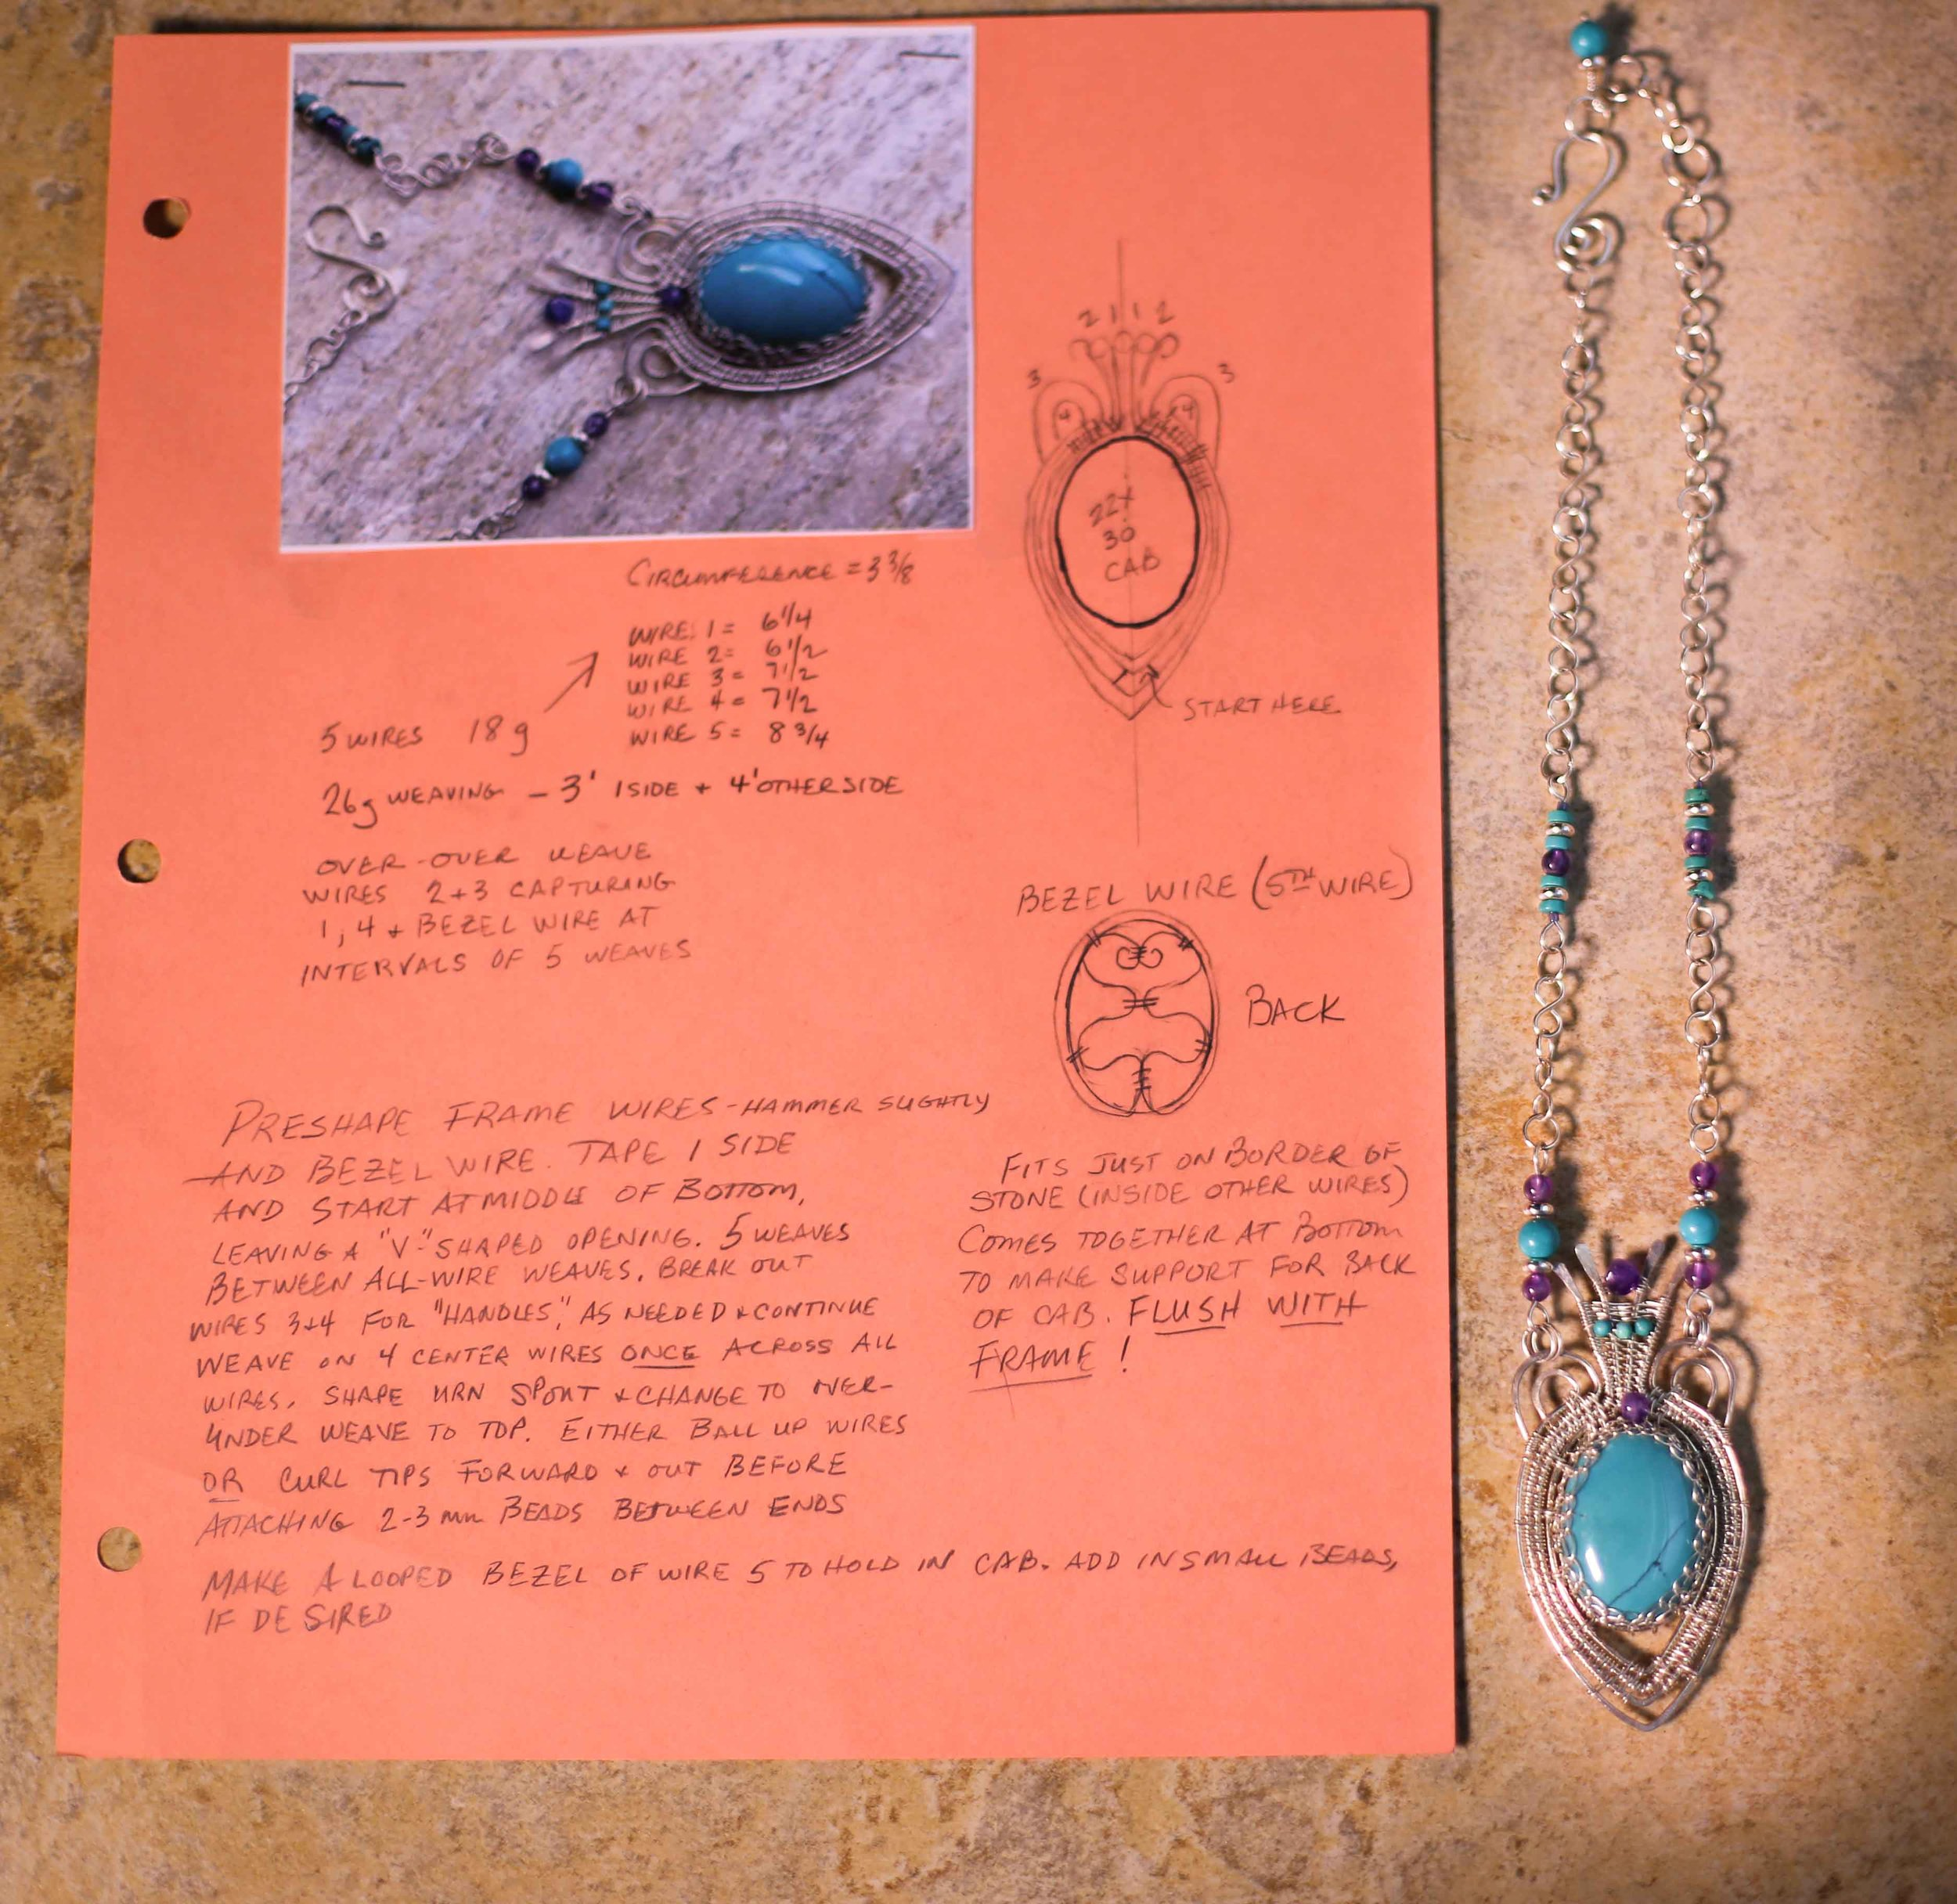 Judy Larsen Gorge Artists Jewlery Craft necklaces pendants wire wrapping custom jewlery art beads pendants charms local artist hood river oregon immense imagery photography websites films digital media_-61.jpg